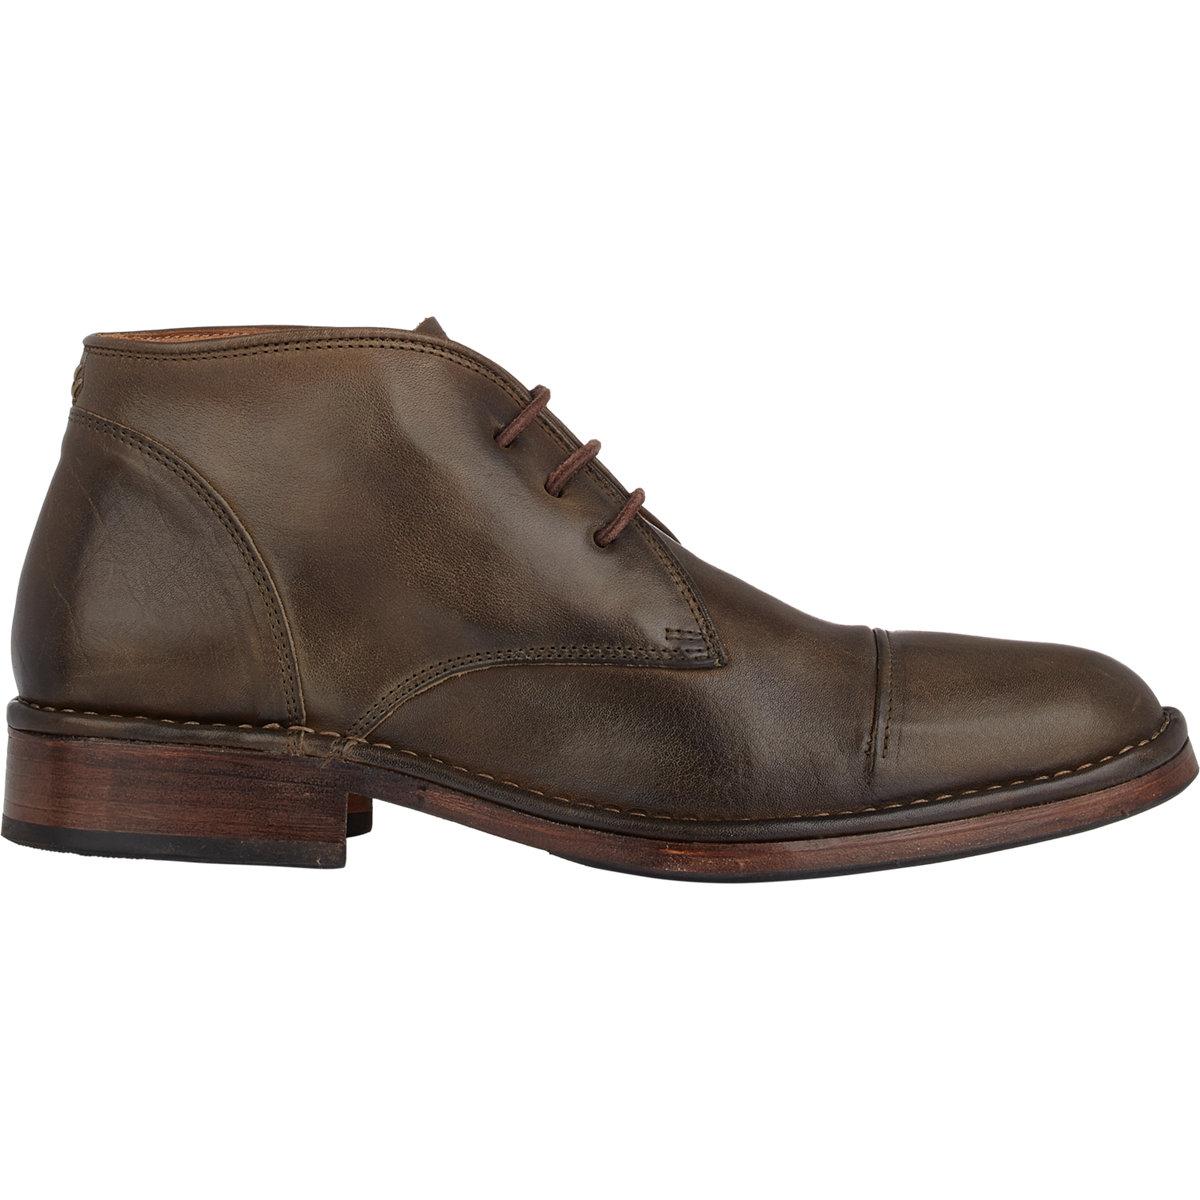 varvatos allen chukka boots brown size 9 5 in brown